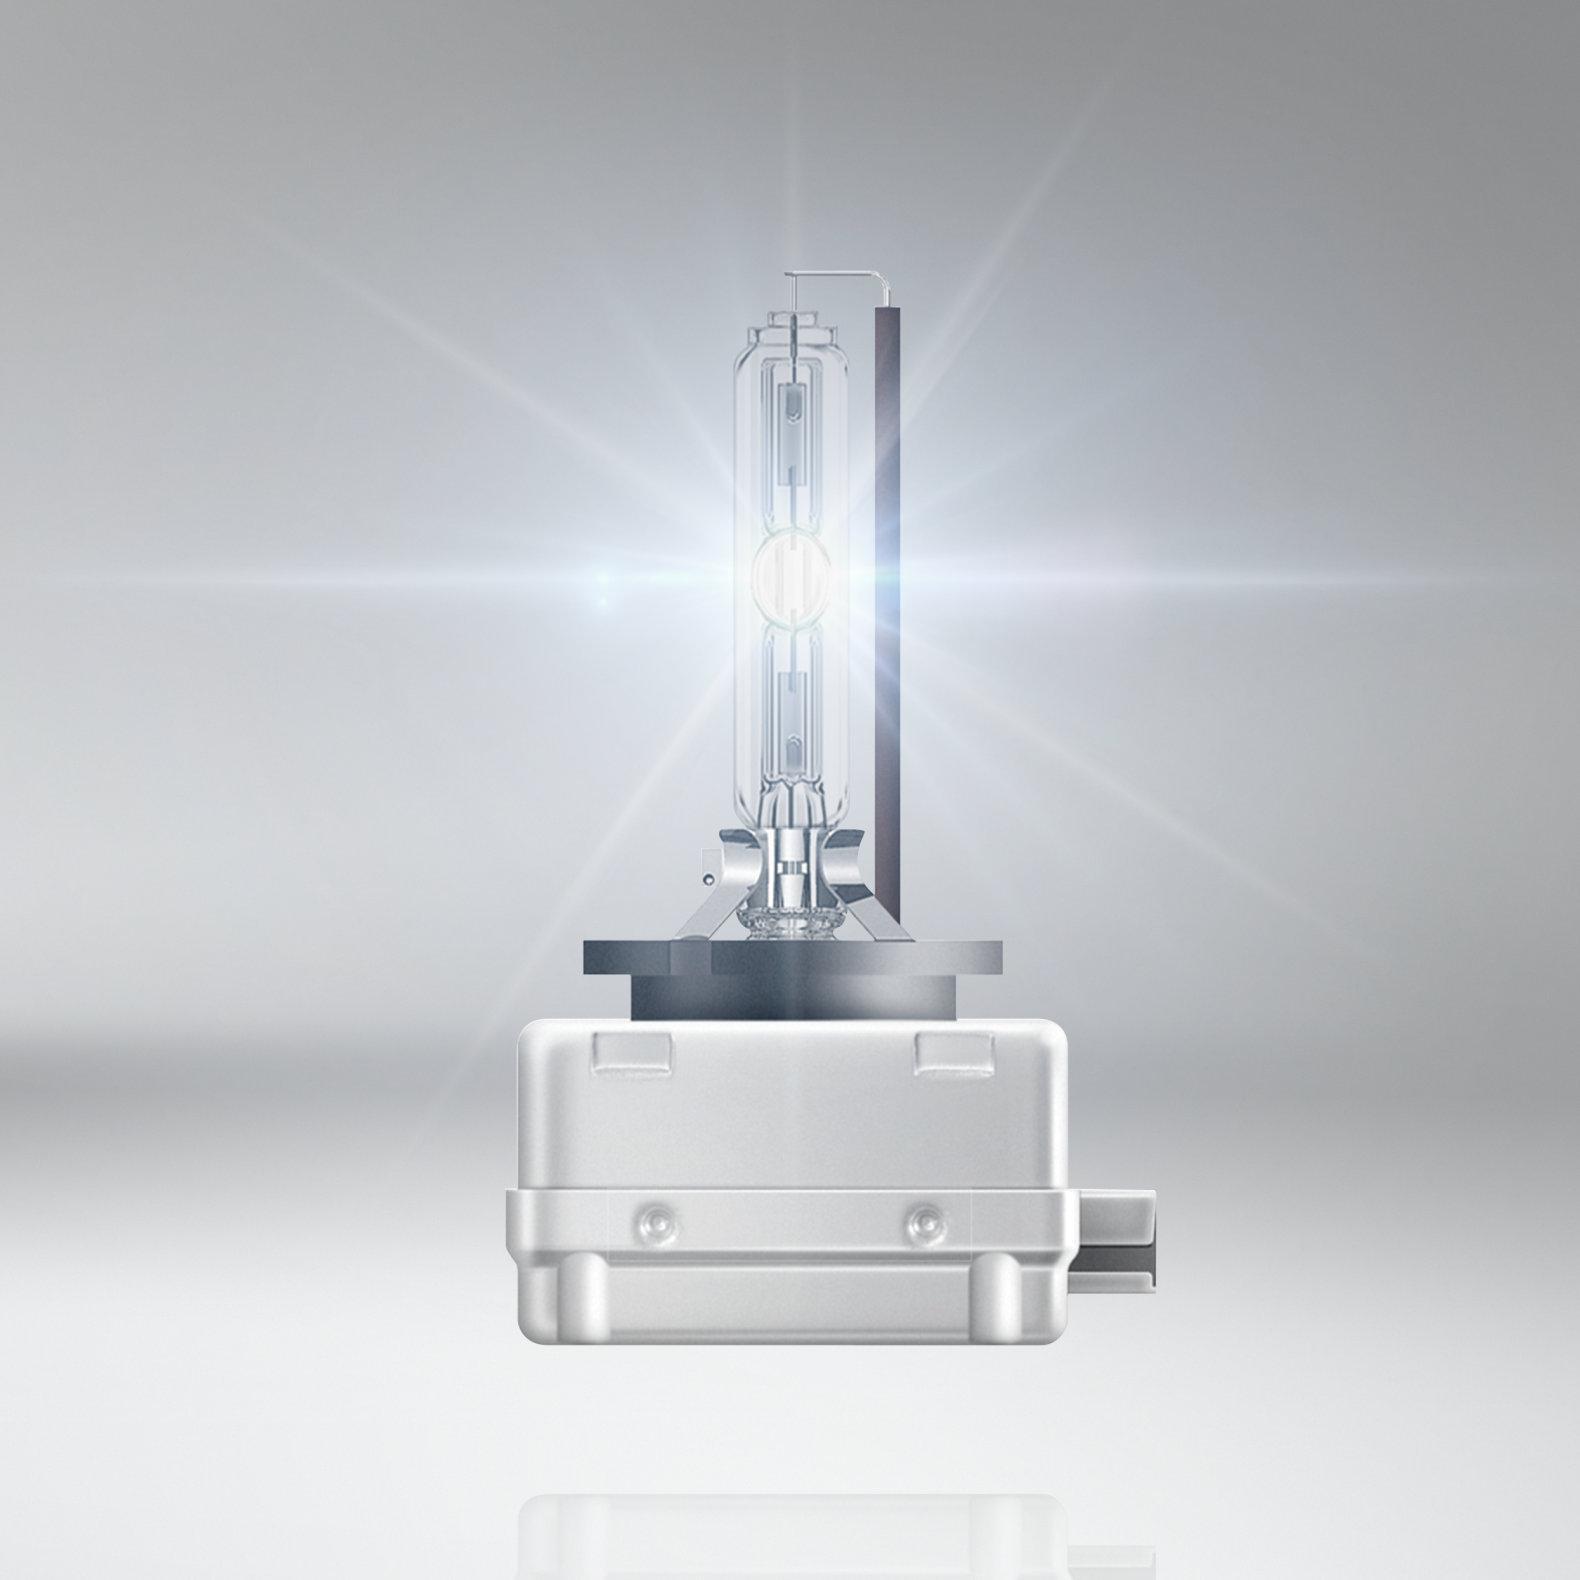 Ксеноновая лампа Osram 66140